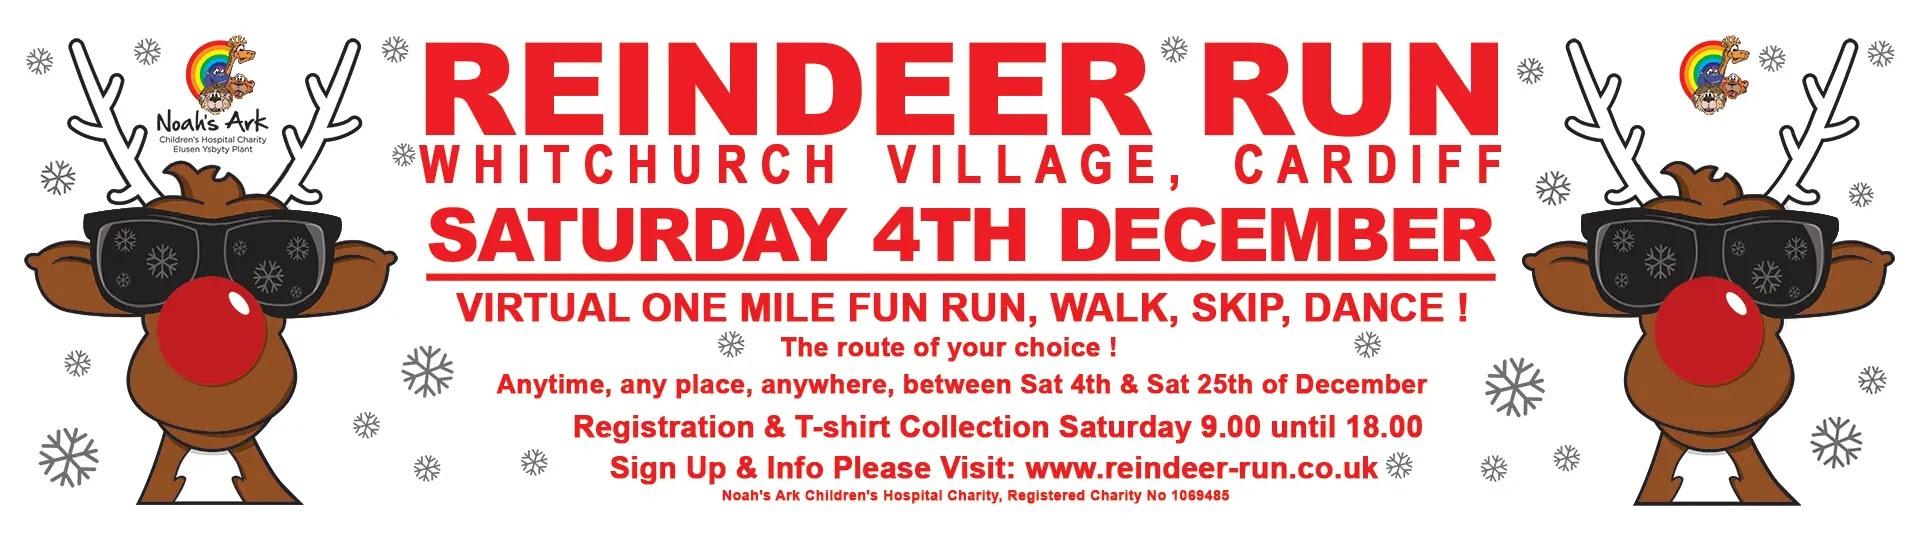 Whitchurch Reindeer Run 2021